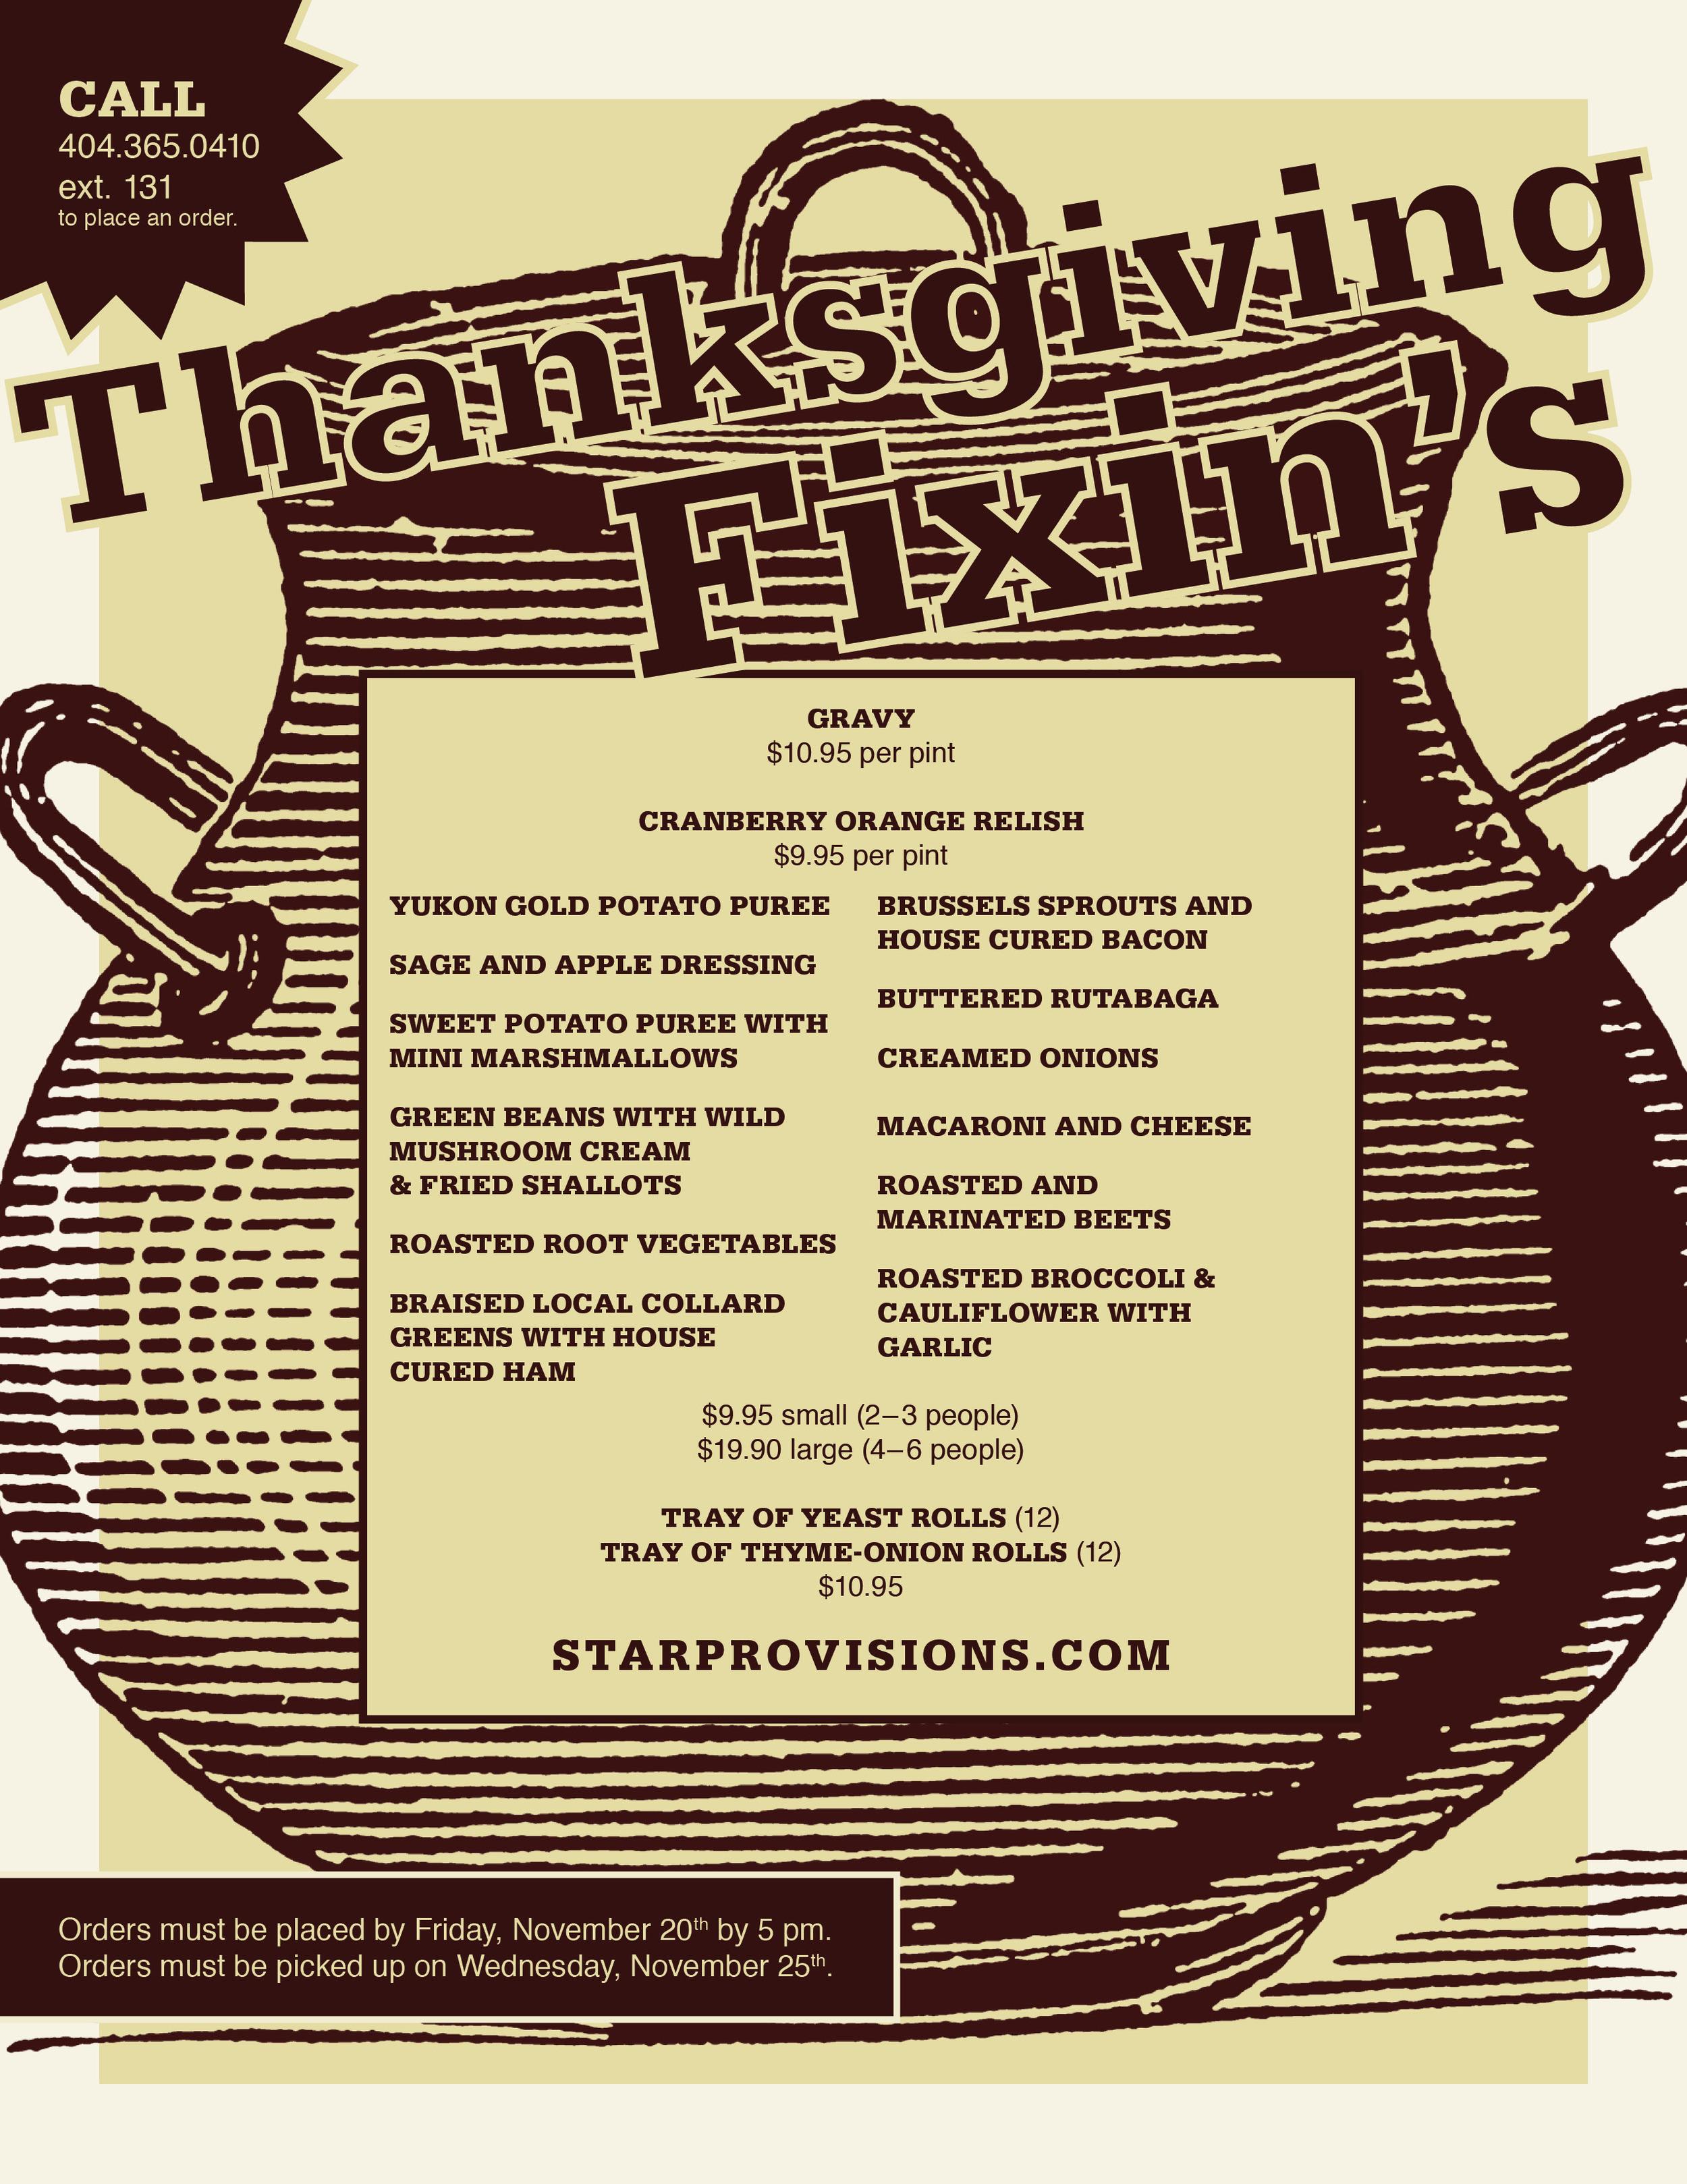 1015-sp-thanksgivingfixins